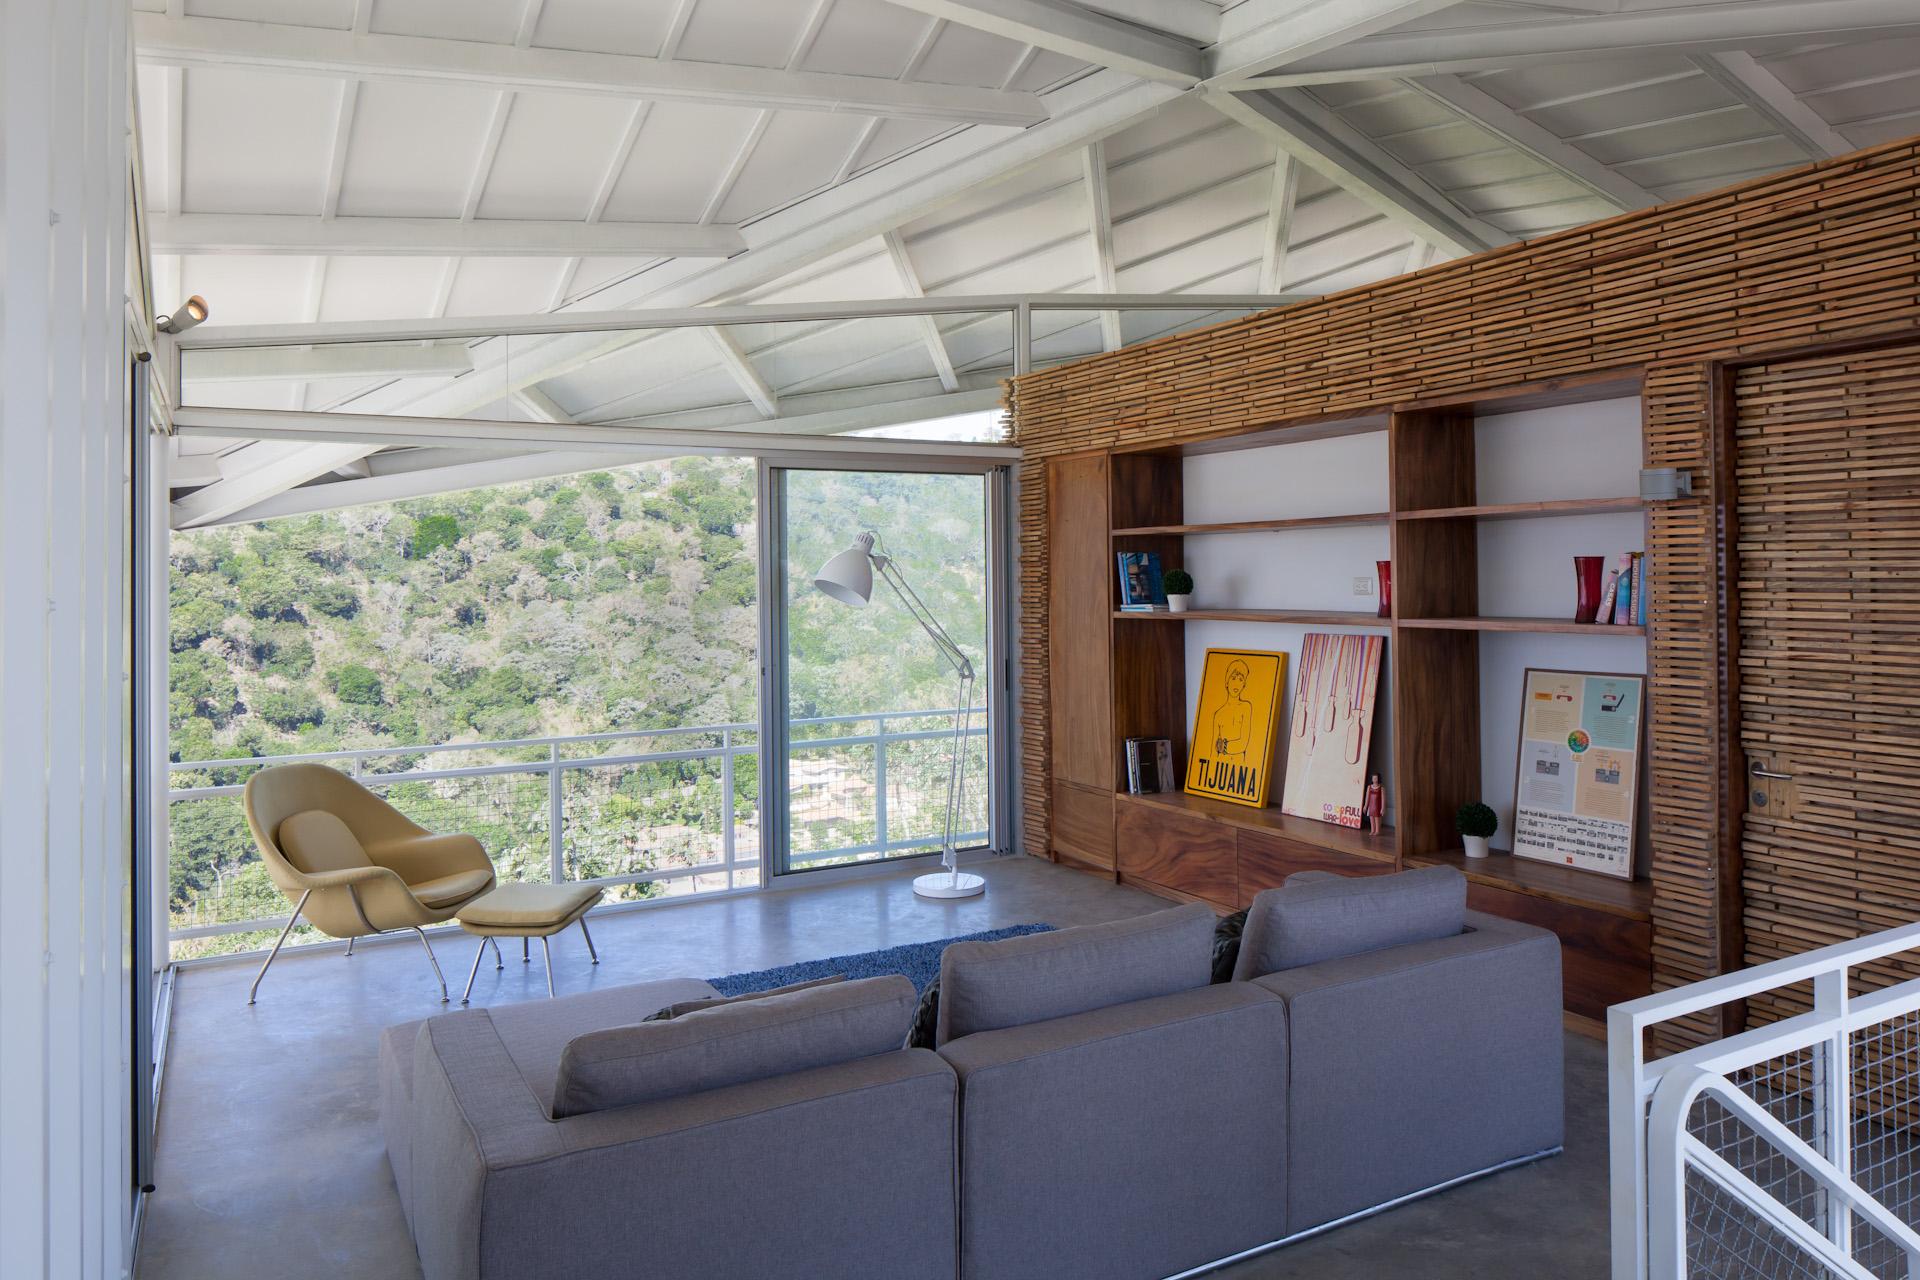 Architecture-Modern-Interior-La-Piscucha-El-Salvador-Dwell-19.JPG